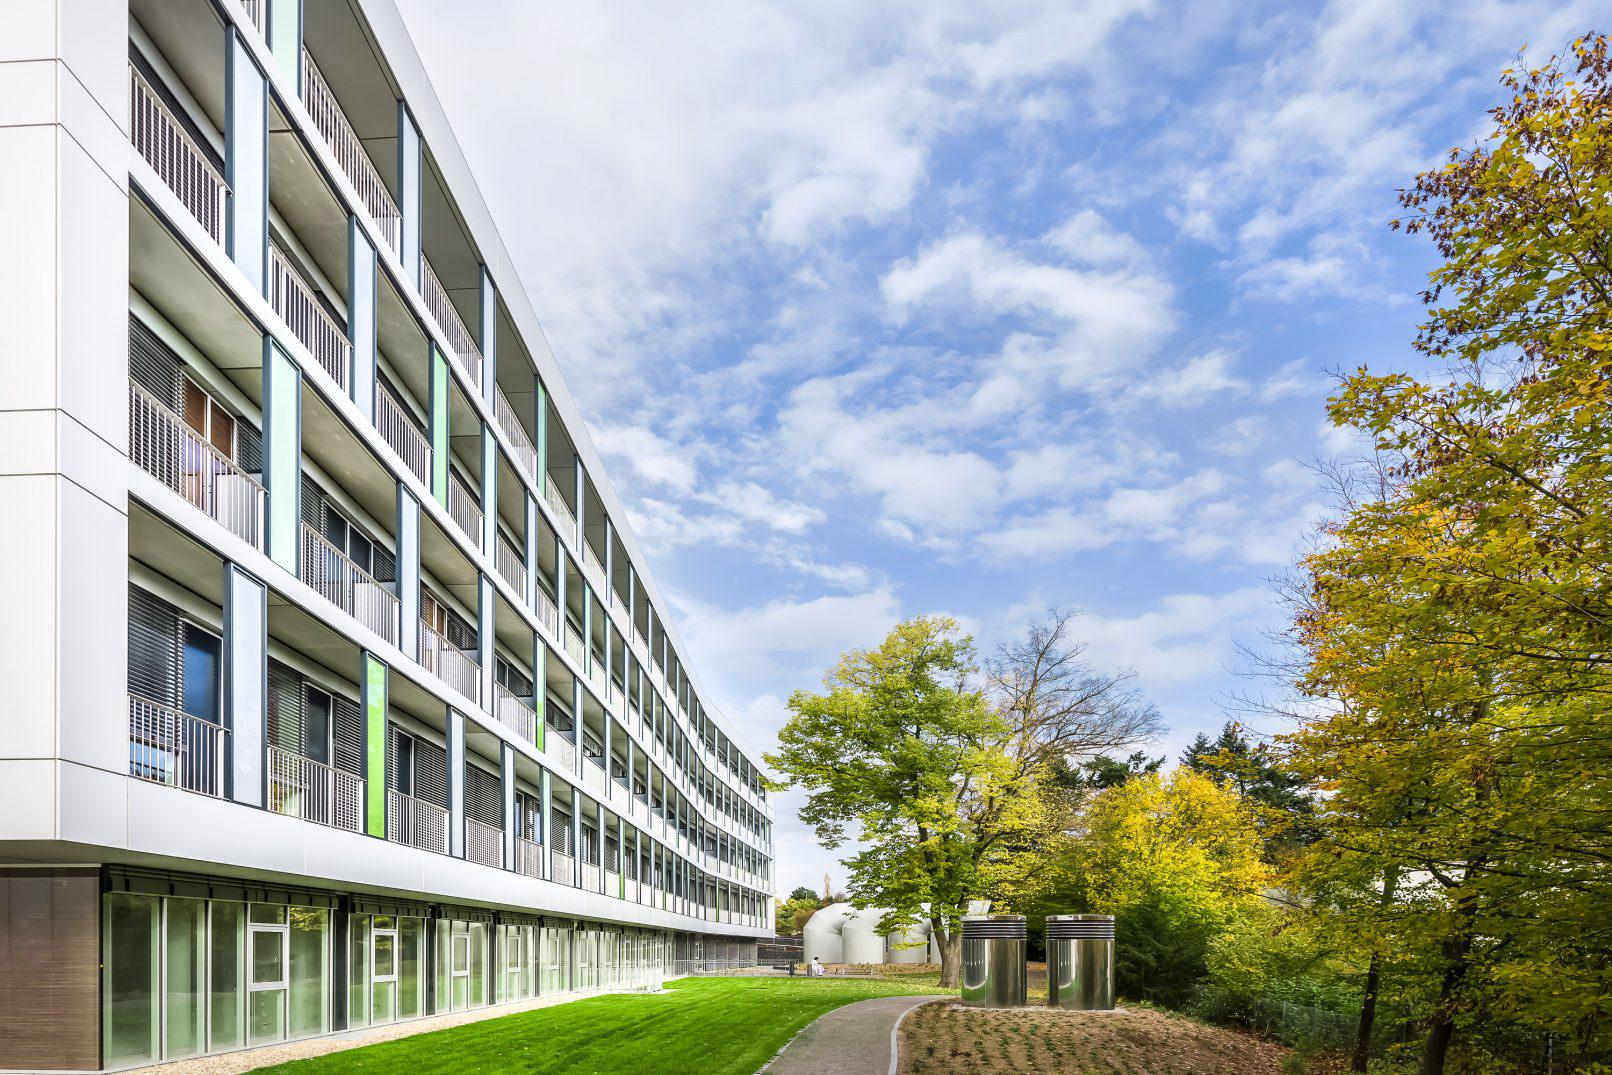 Immobilienfotograf in Erfurt ©Offenblende / Jan JKO